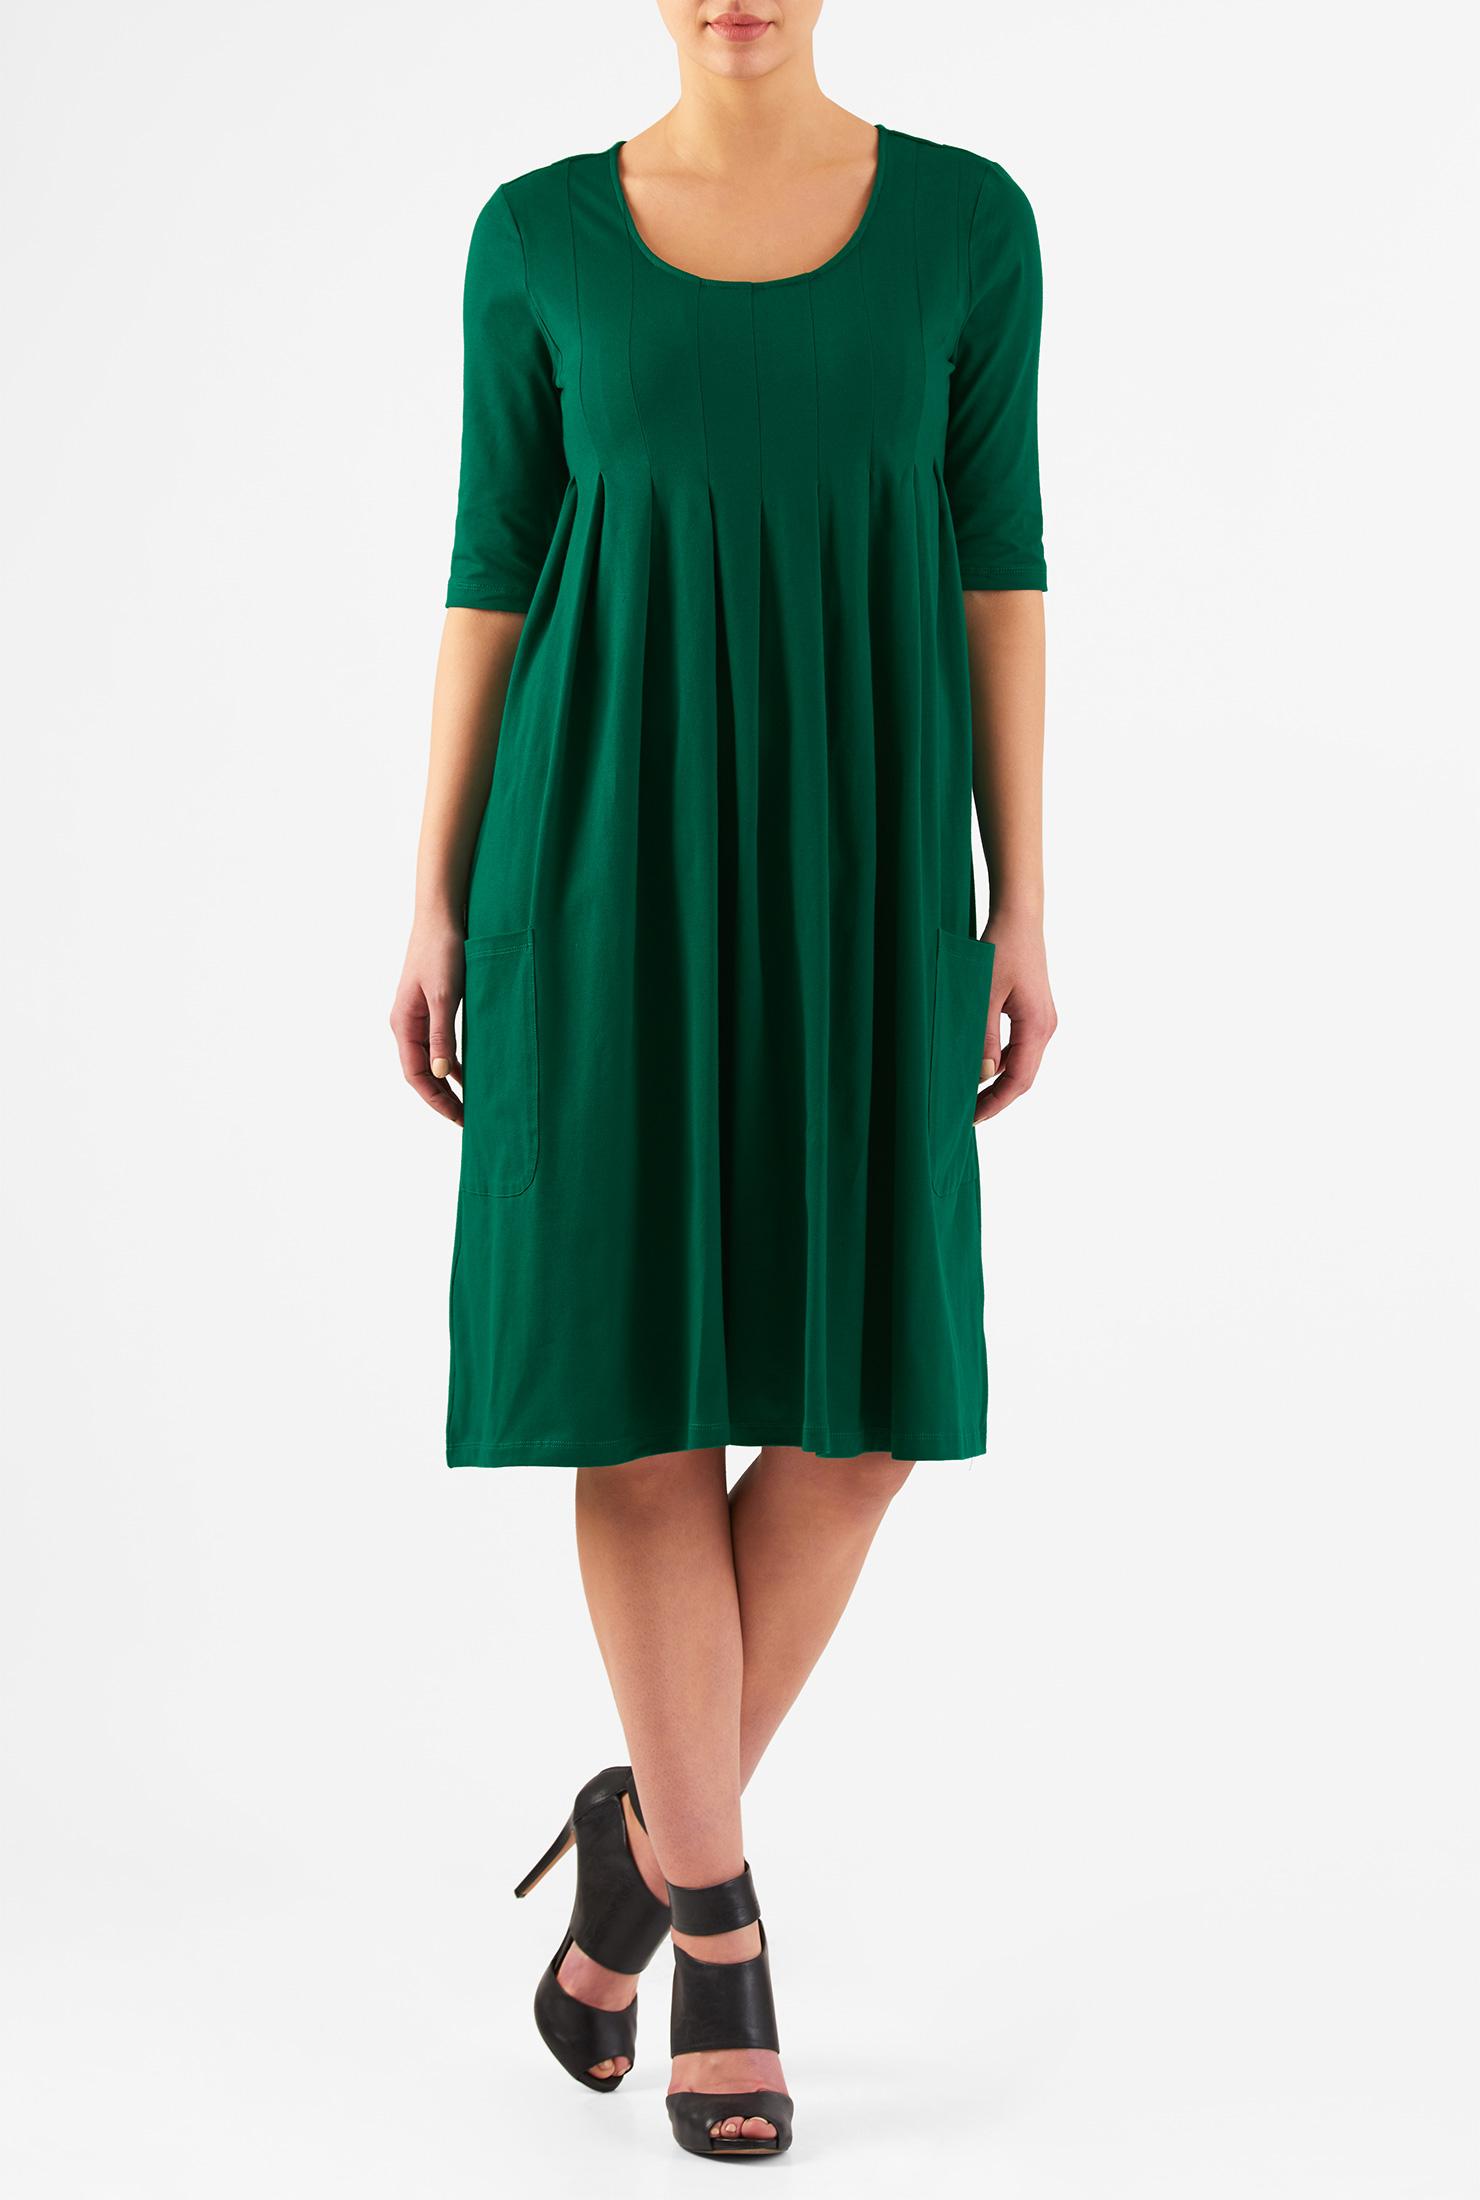 eShakti Women's Scoop neck pleated cotton knit dress CL0046516